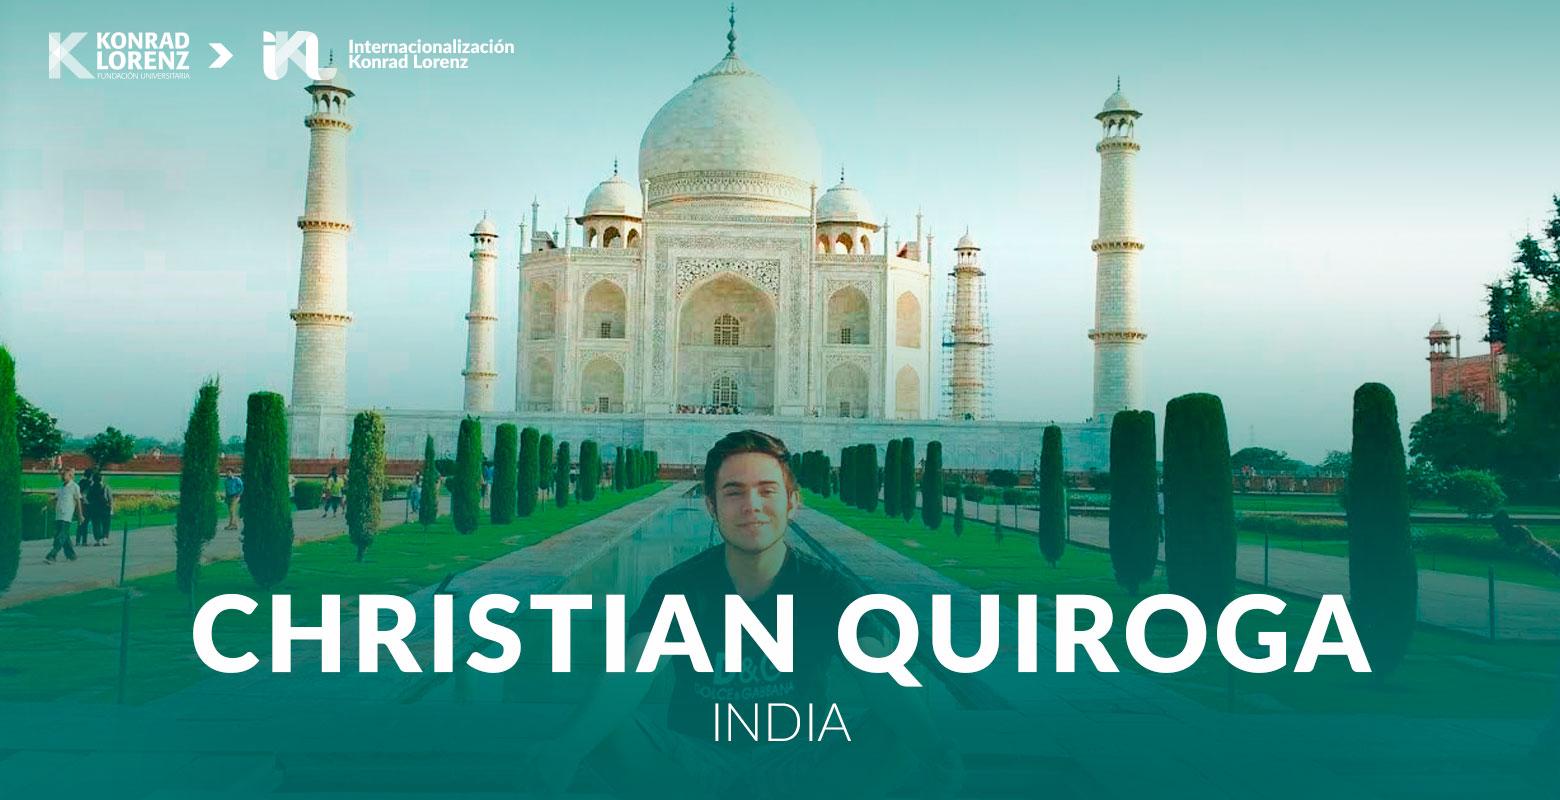 Christian Quiroga